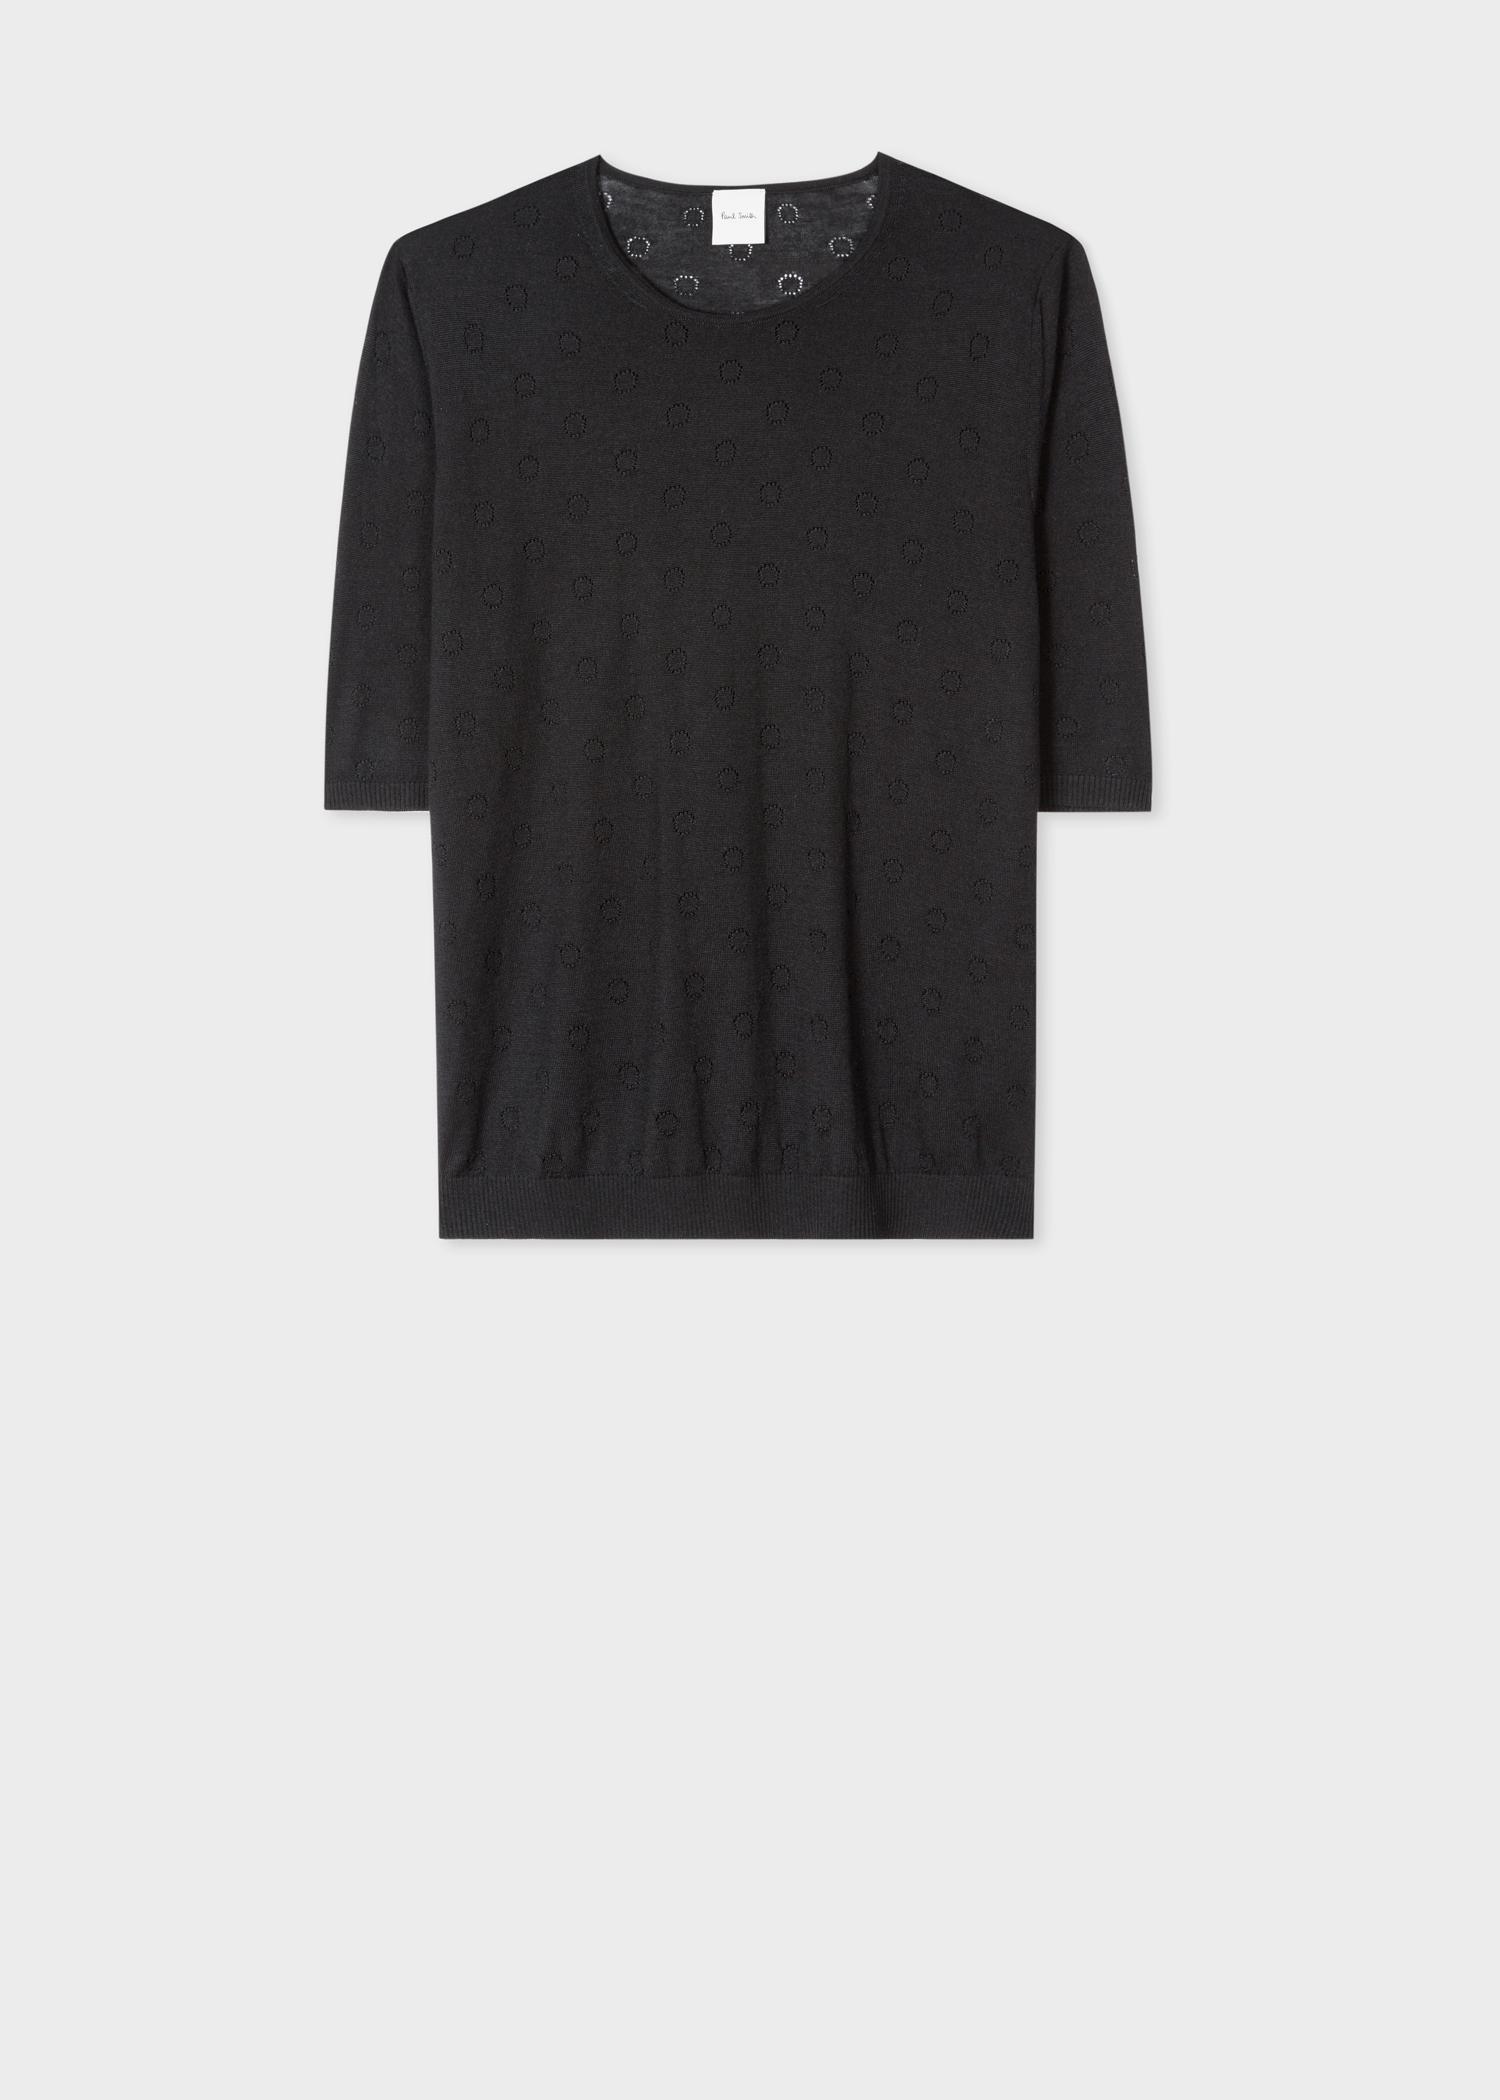 27e150c63fc Women's Black Merino Wool And Silk-Blend Knitted T-Shirt Paul Smith